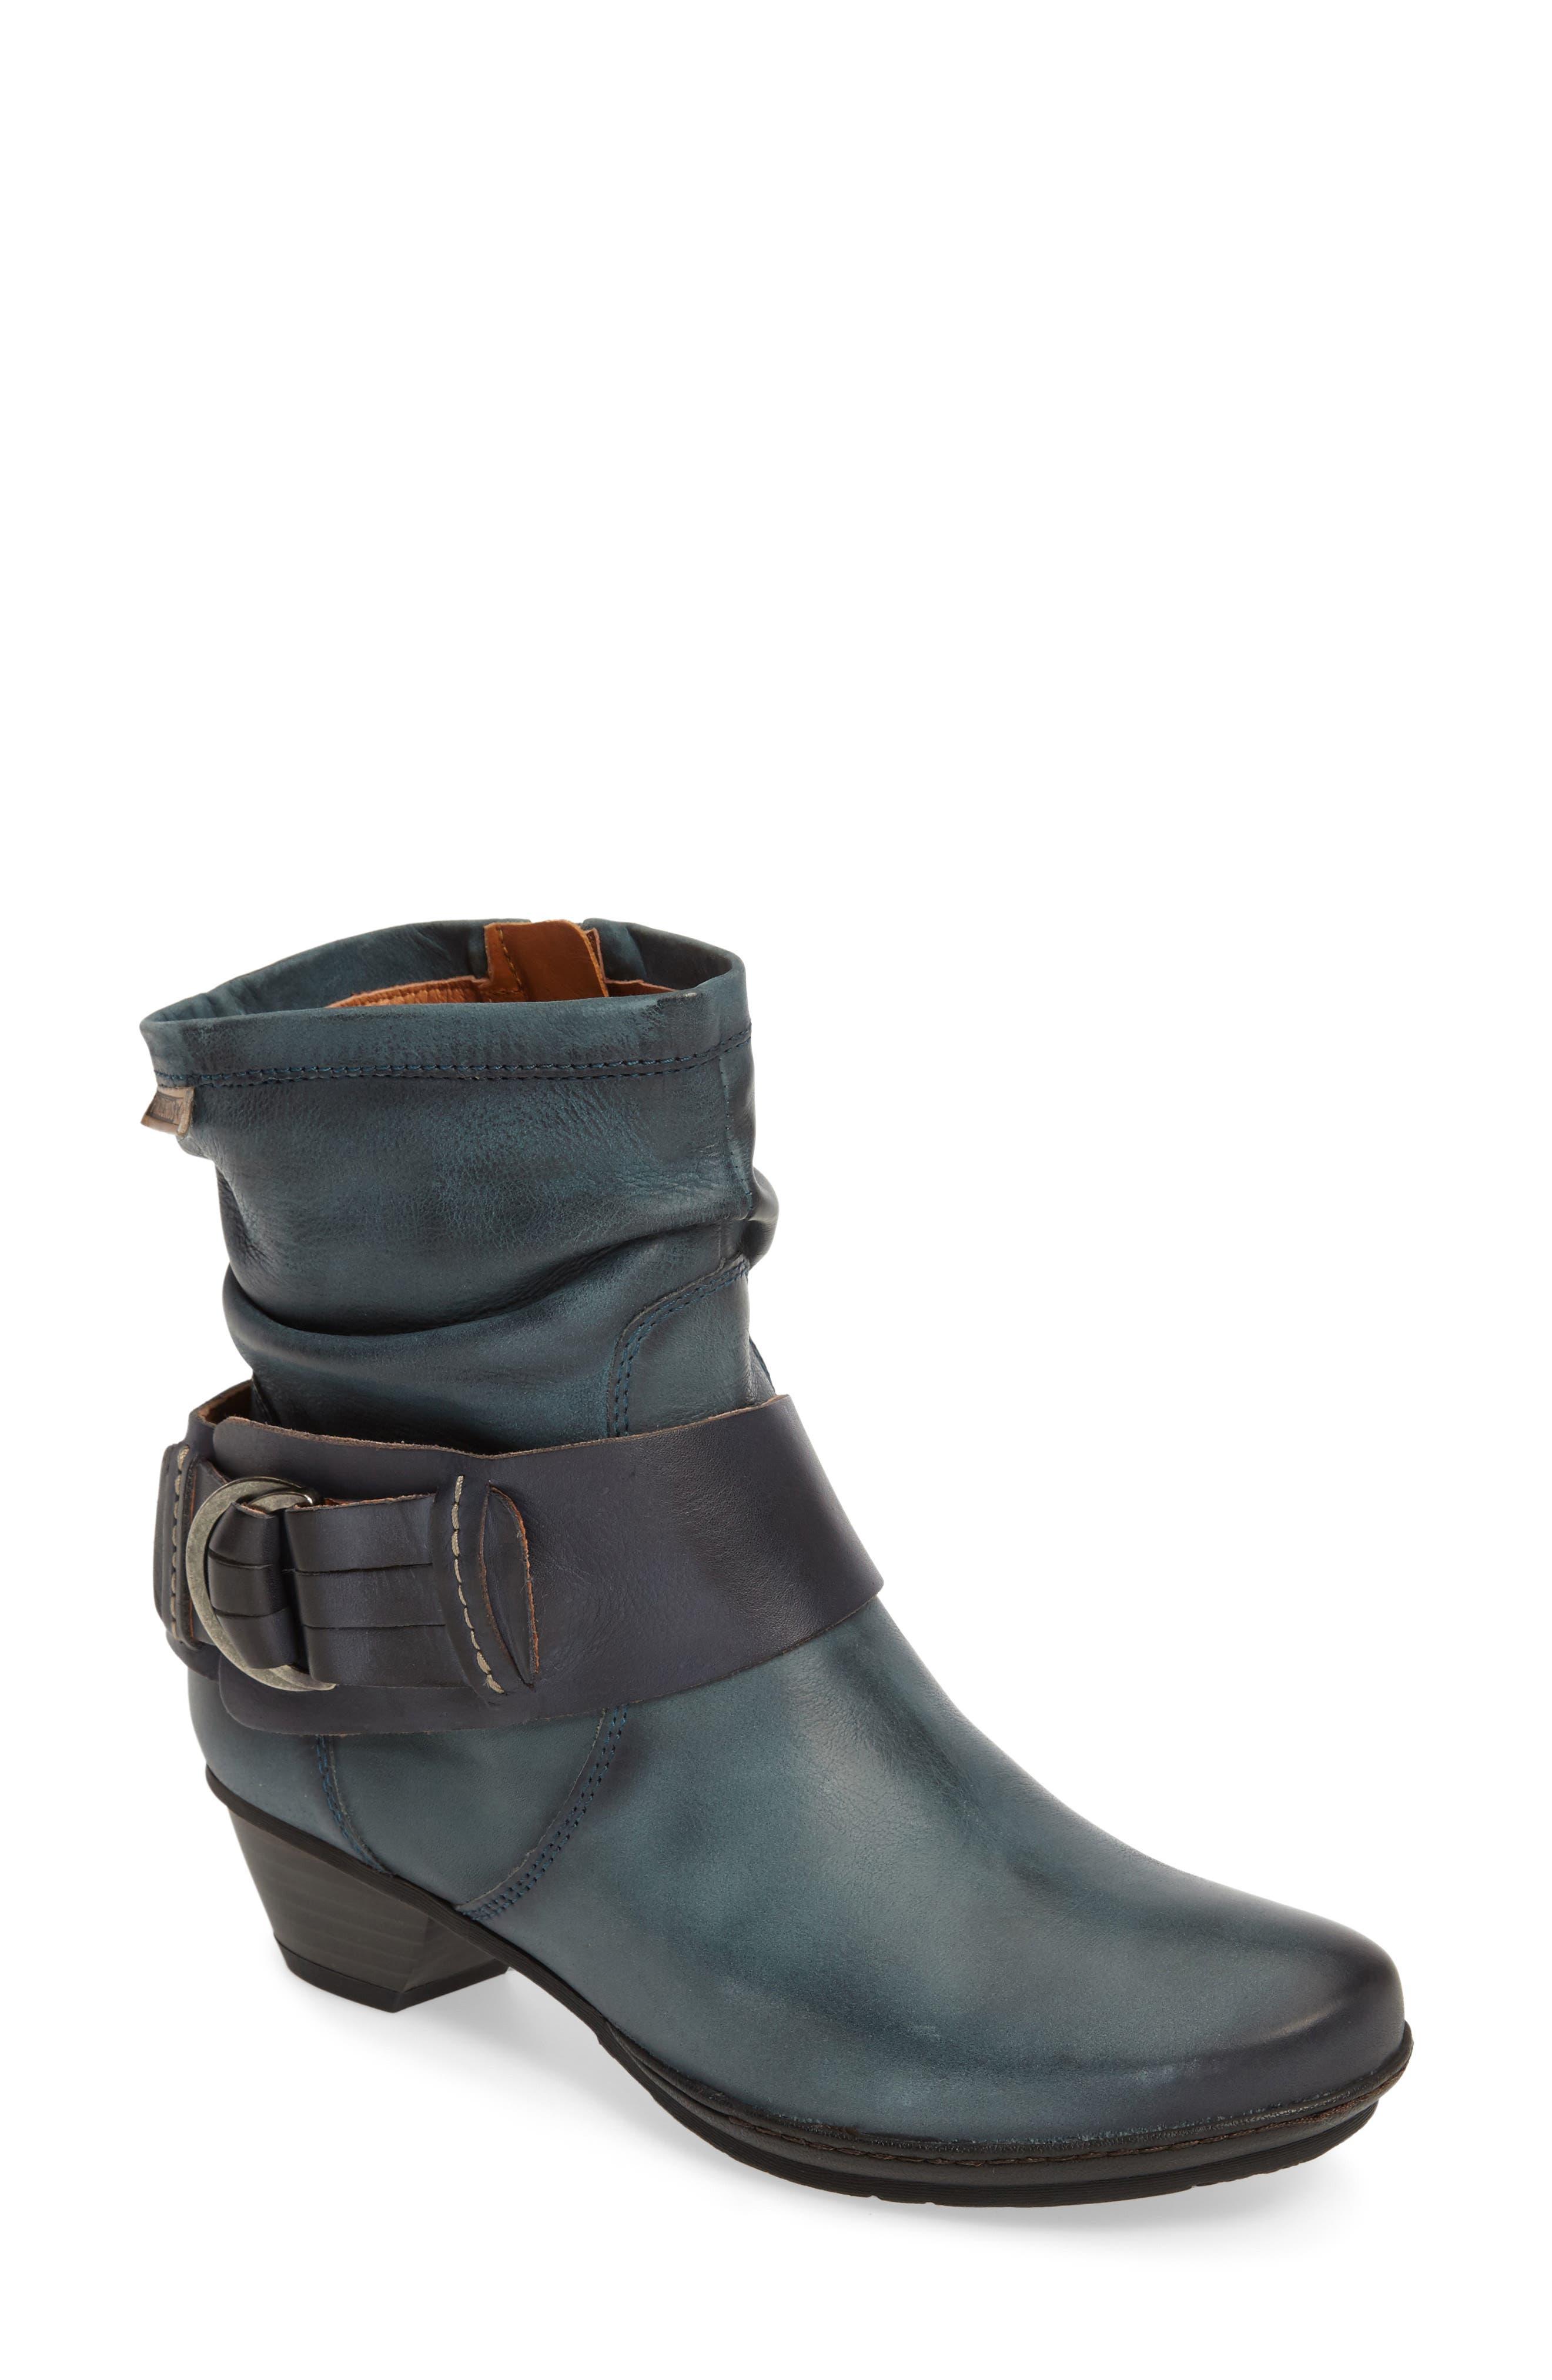 Main Image - PIKOLINOS 'Brujas 801' Boot (Women)